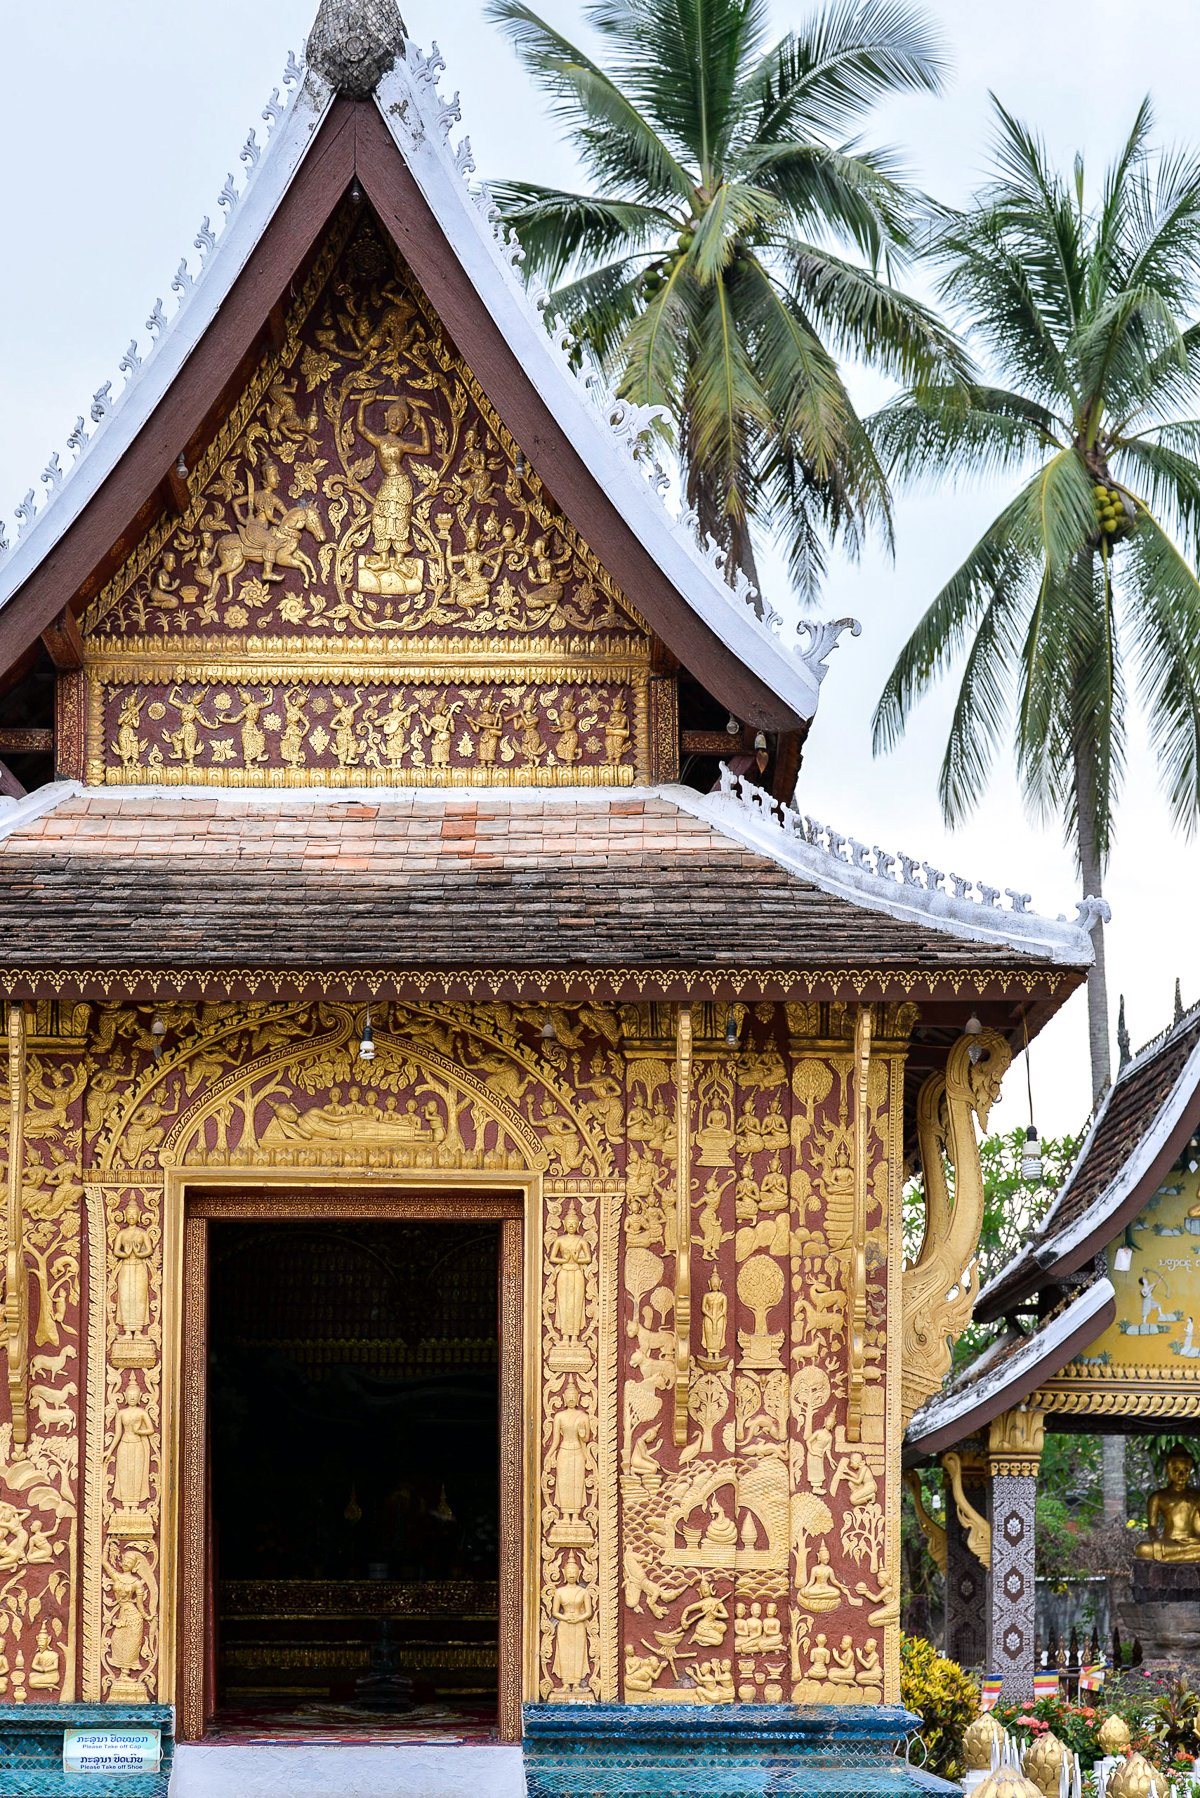 Stacie Flinner 3 Nagas Complete Guide to Luang Prabang-91.jpg